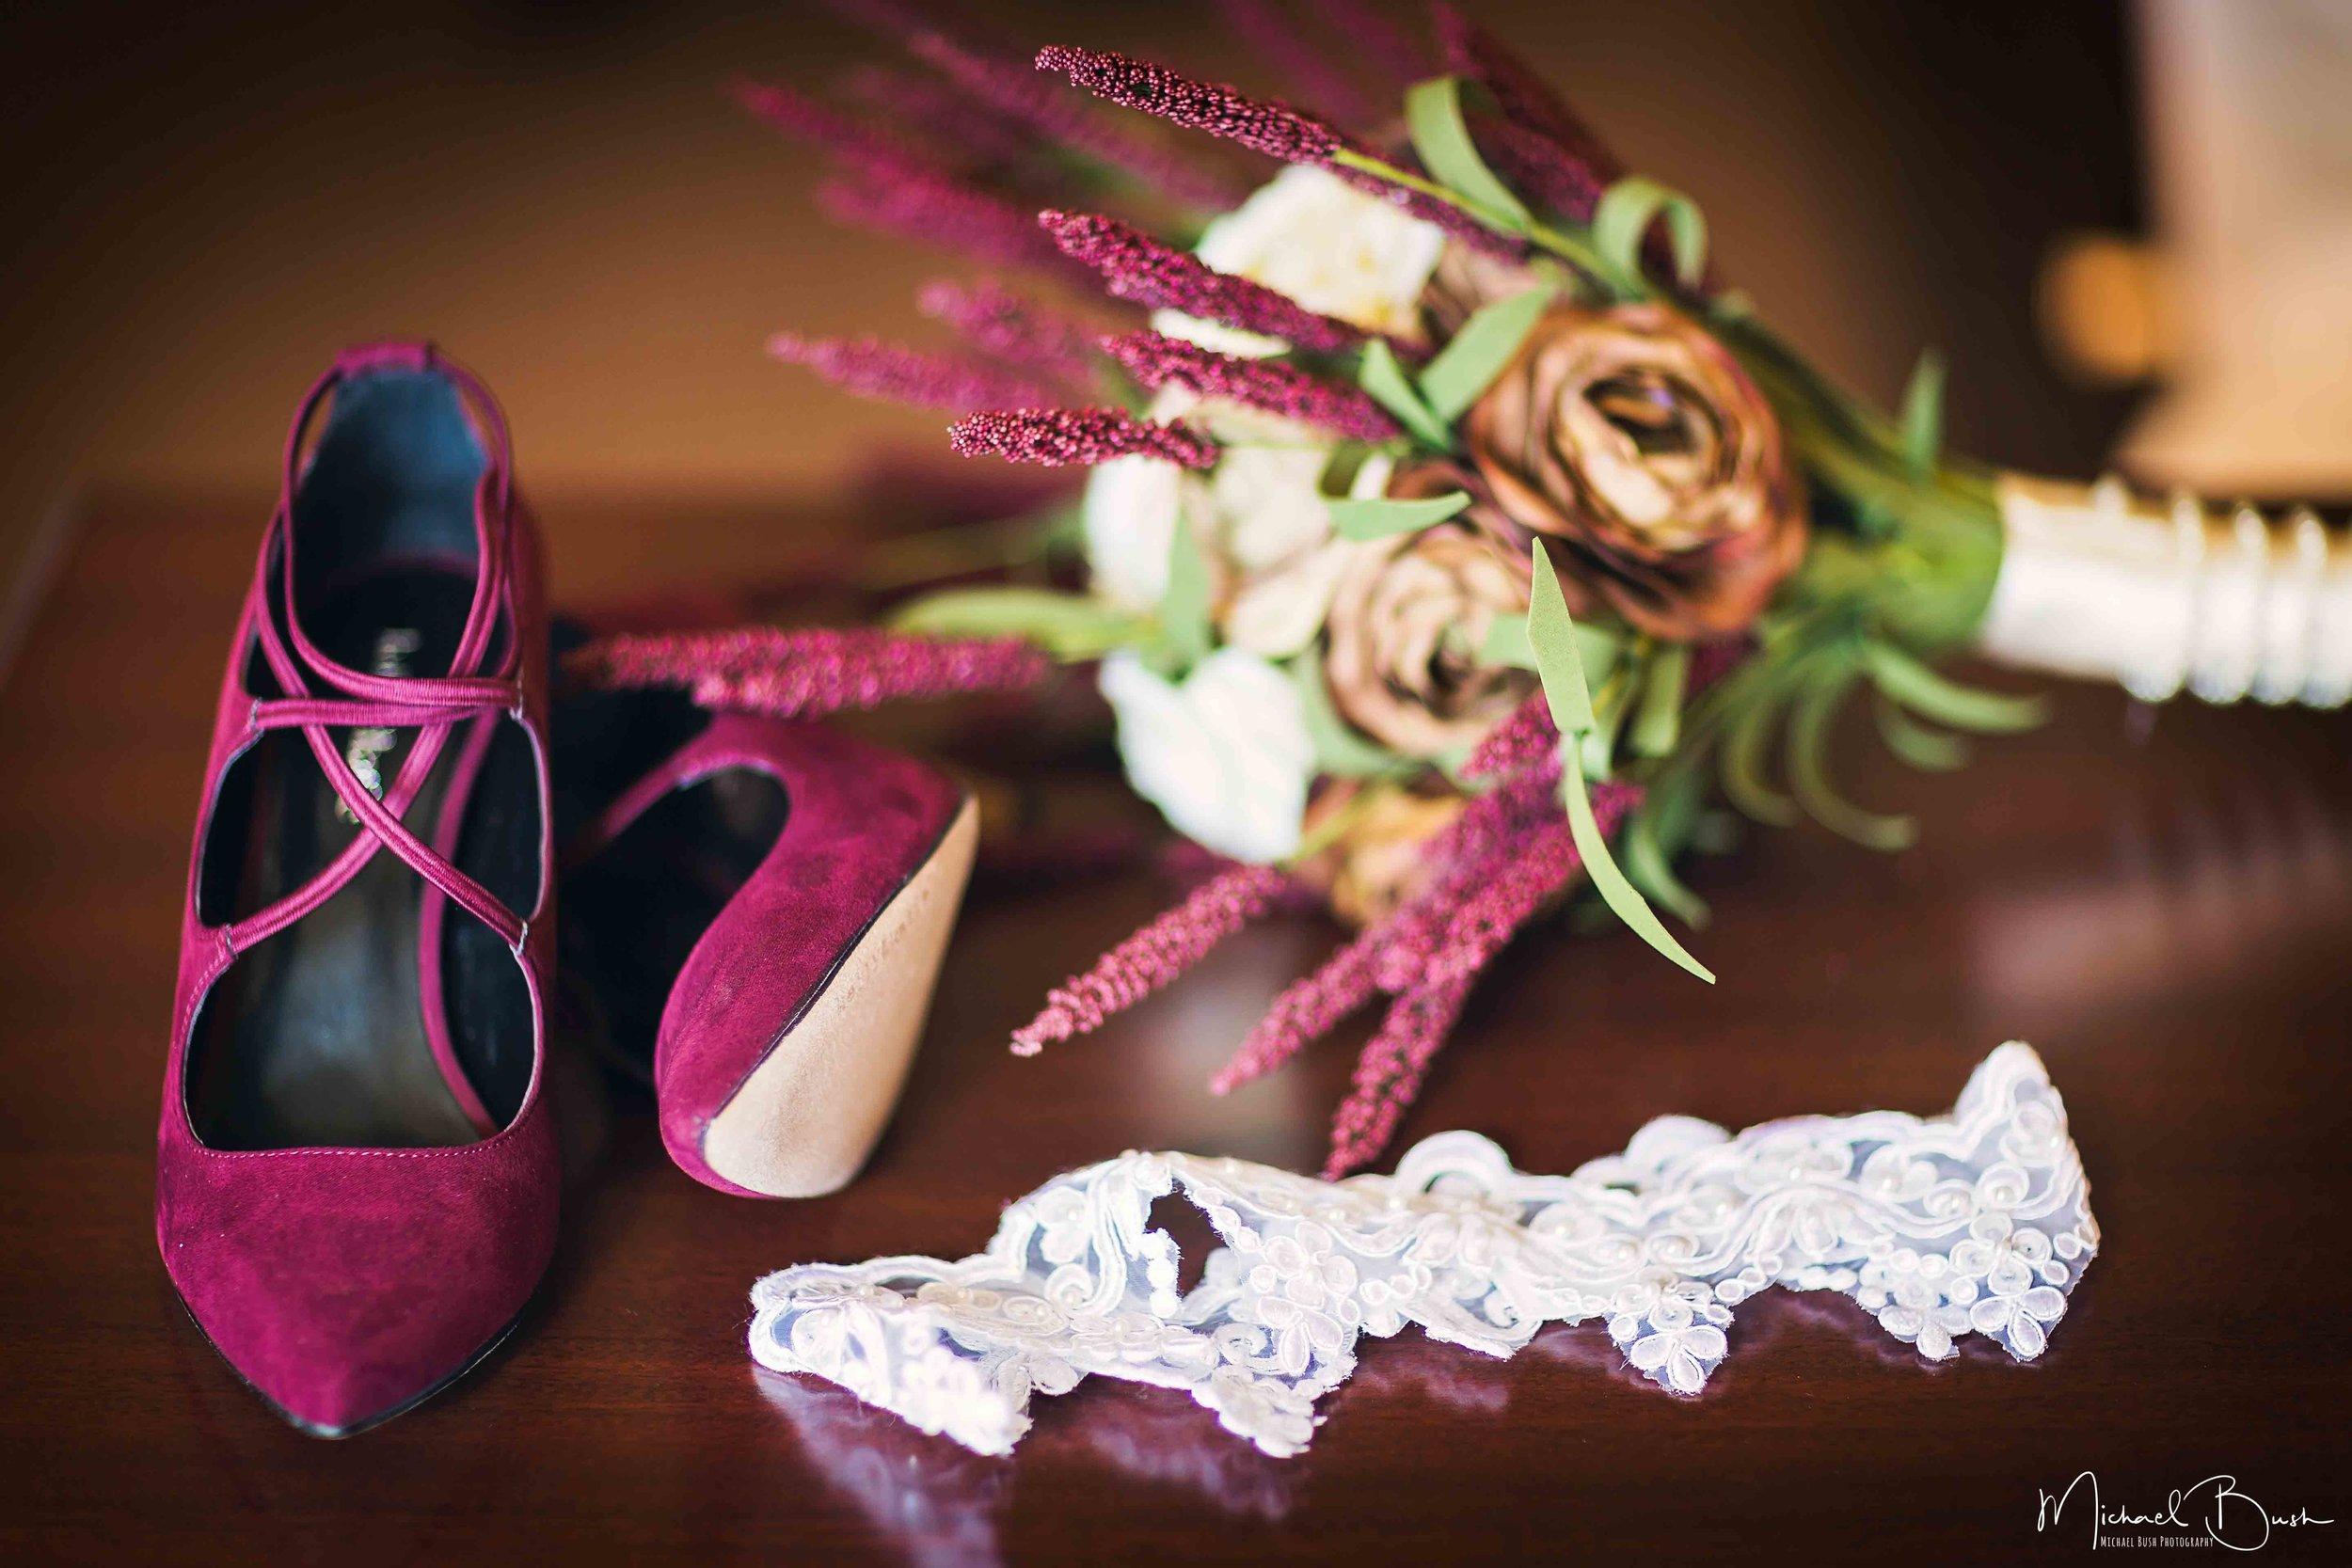 Wedding-Details-Bride-Fort Worth-colors-Getting Ready-MUA-brides-dress-shoes-crown-wedding bouquet-bouquet.jpg